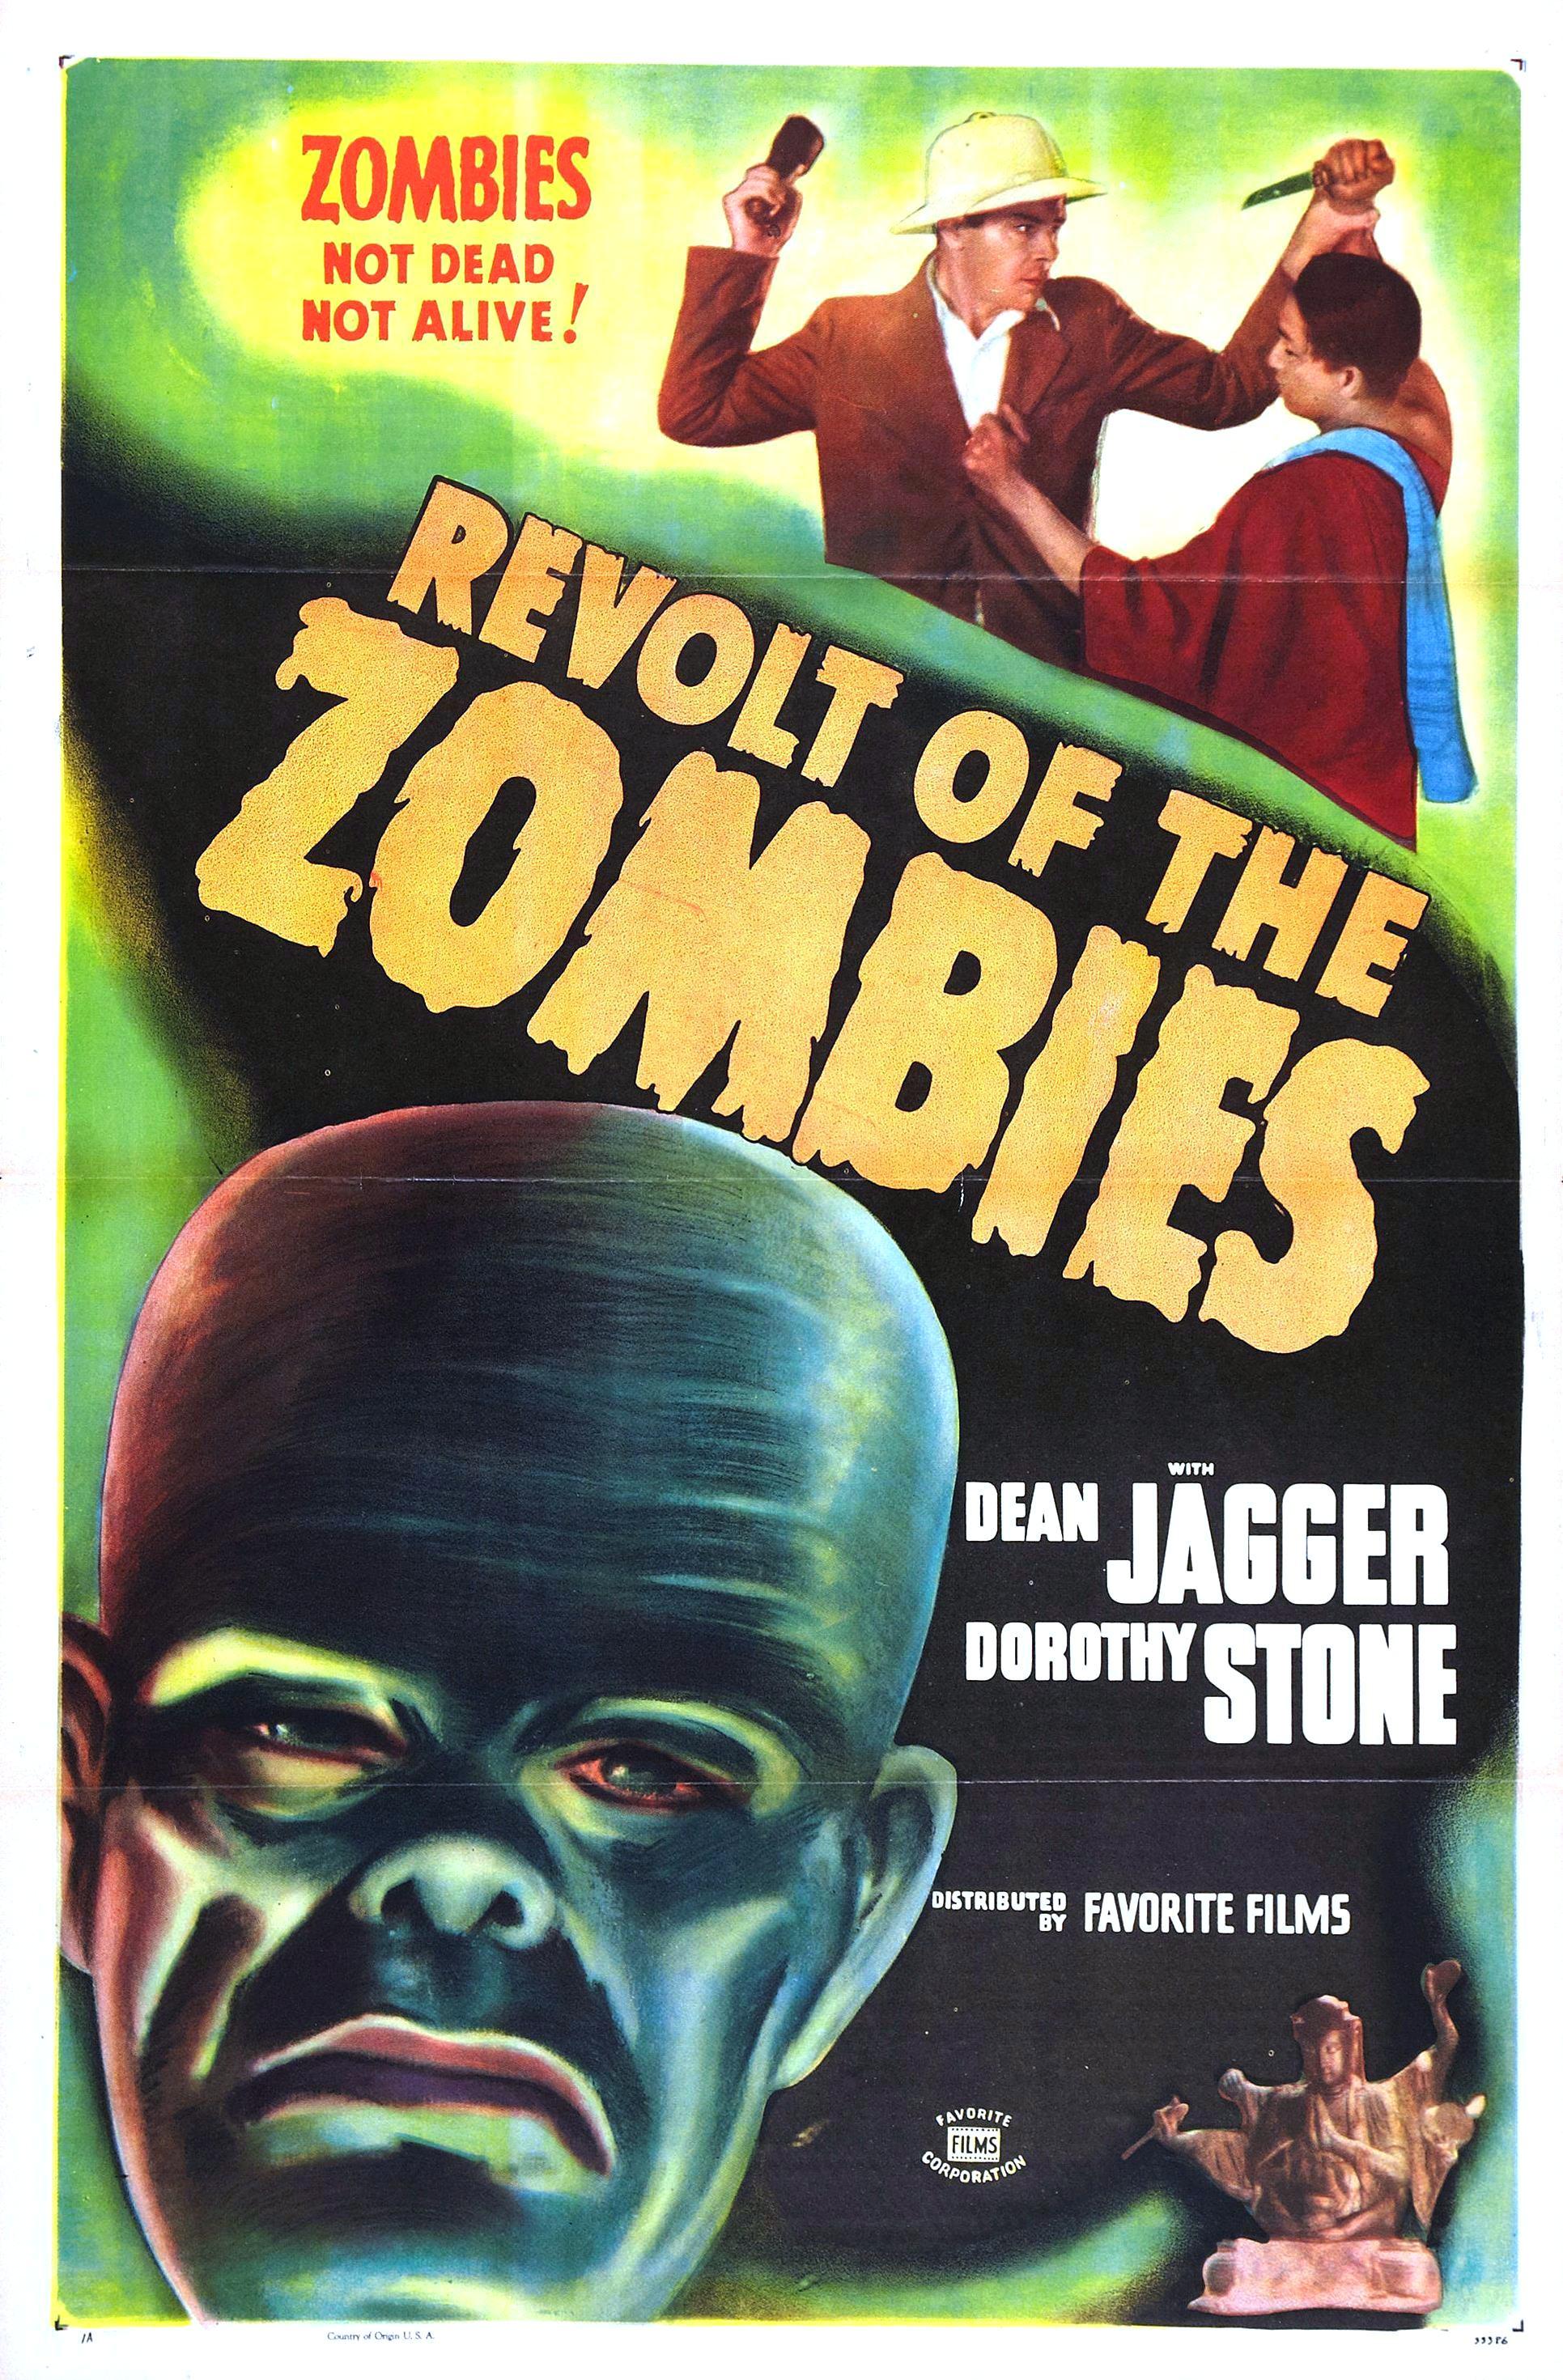 revolt-of-the-zombies-1kite44revolt-of-the-zombies-1revolt-of-the-zombies-8revolt-of-the-zombies-9revolt-of-the-zombies-17